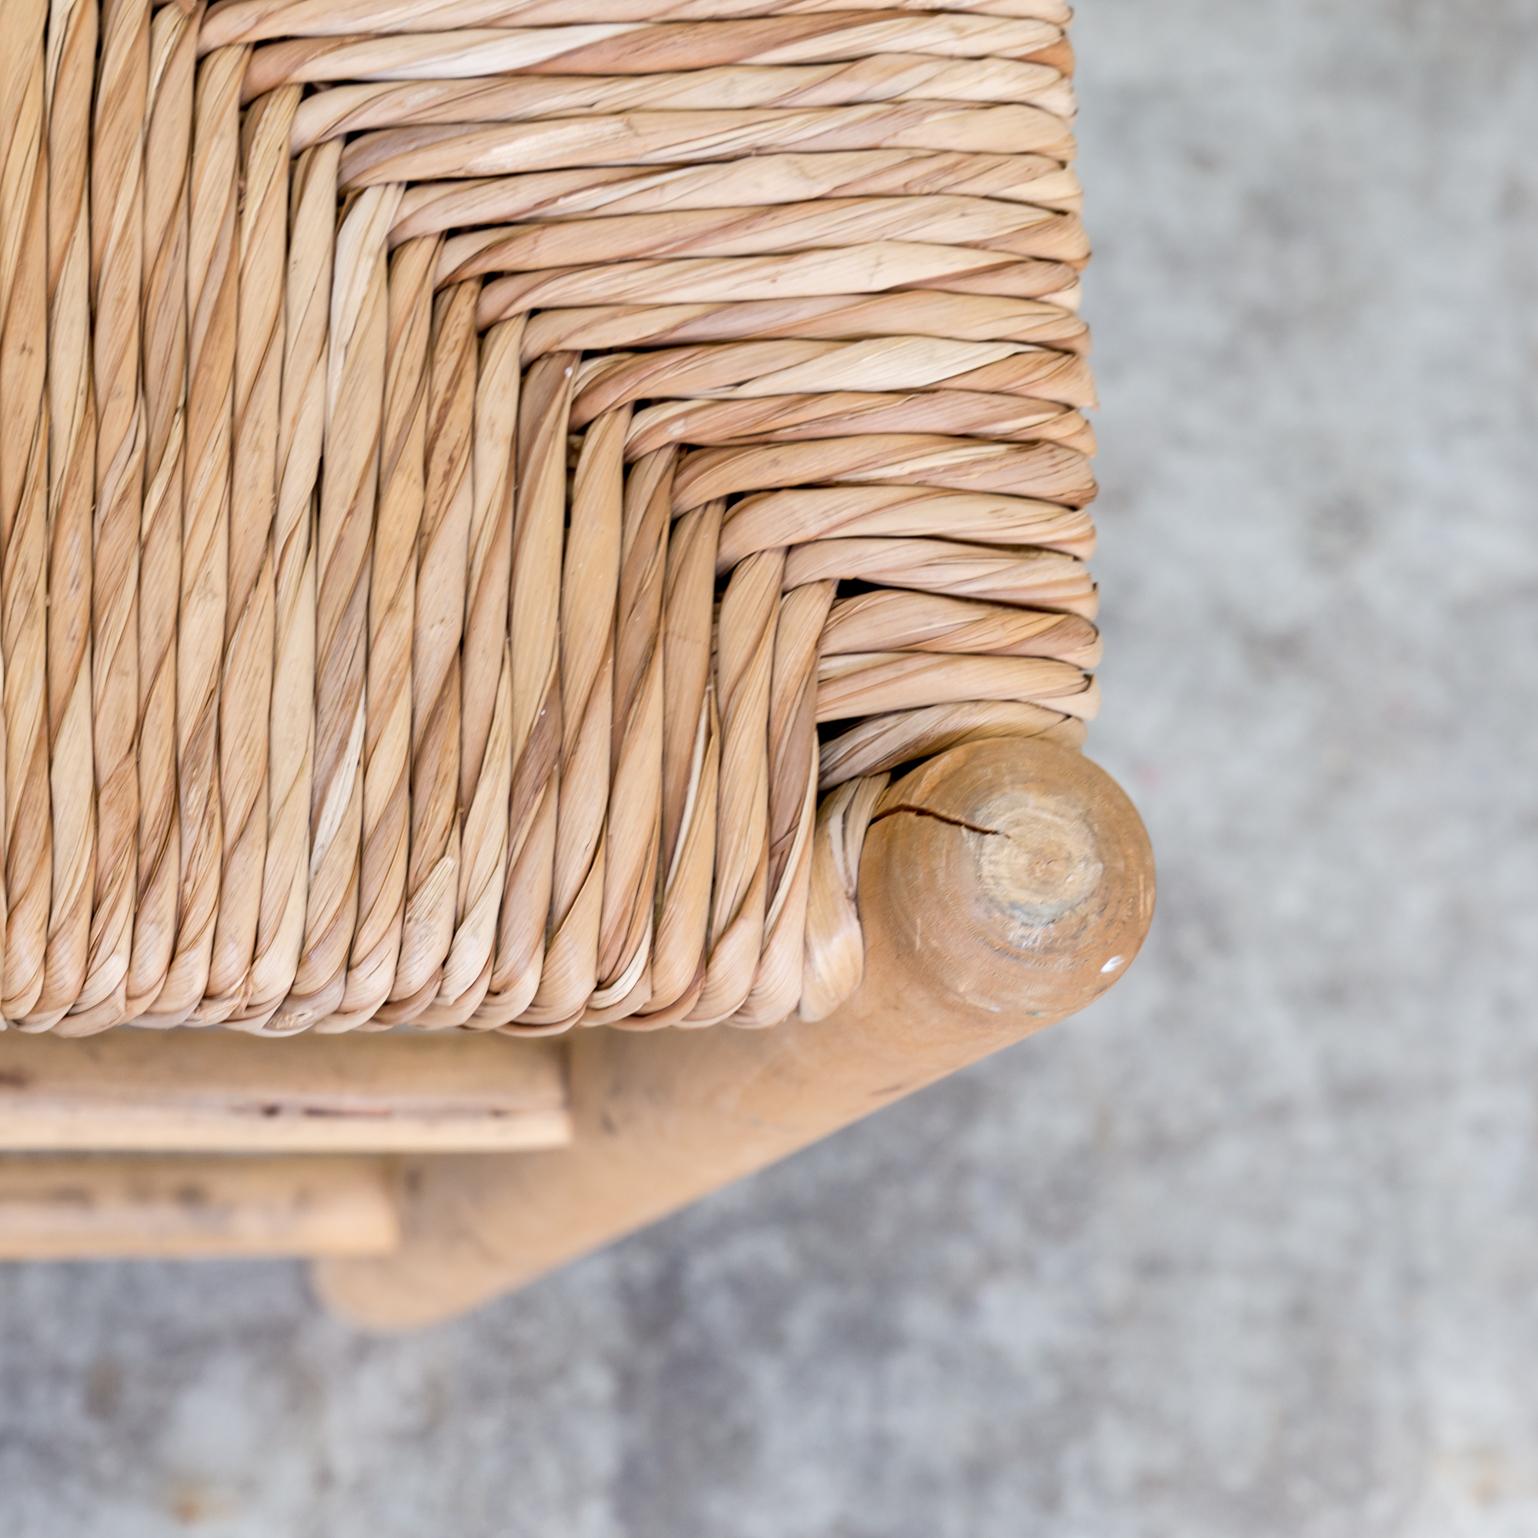 charlotte perriand stool wicker for l equipement de la. Black Bedroom Furniture Sets. Home Design Ideas